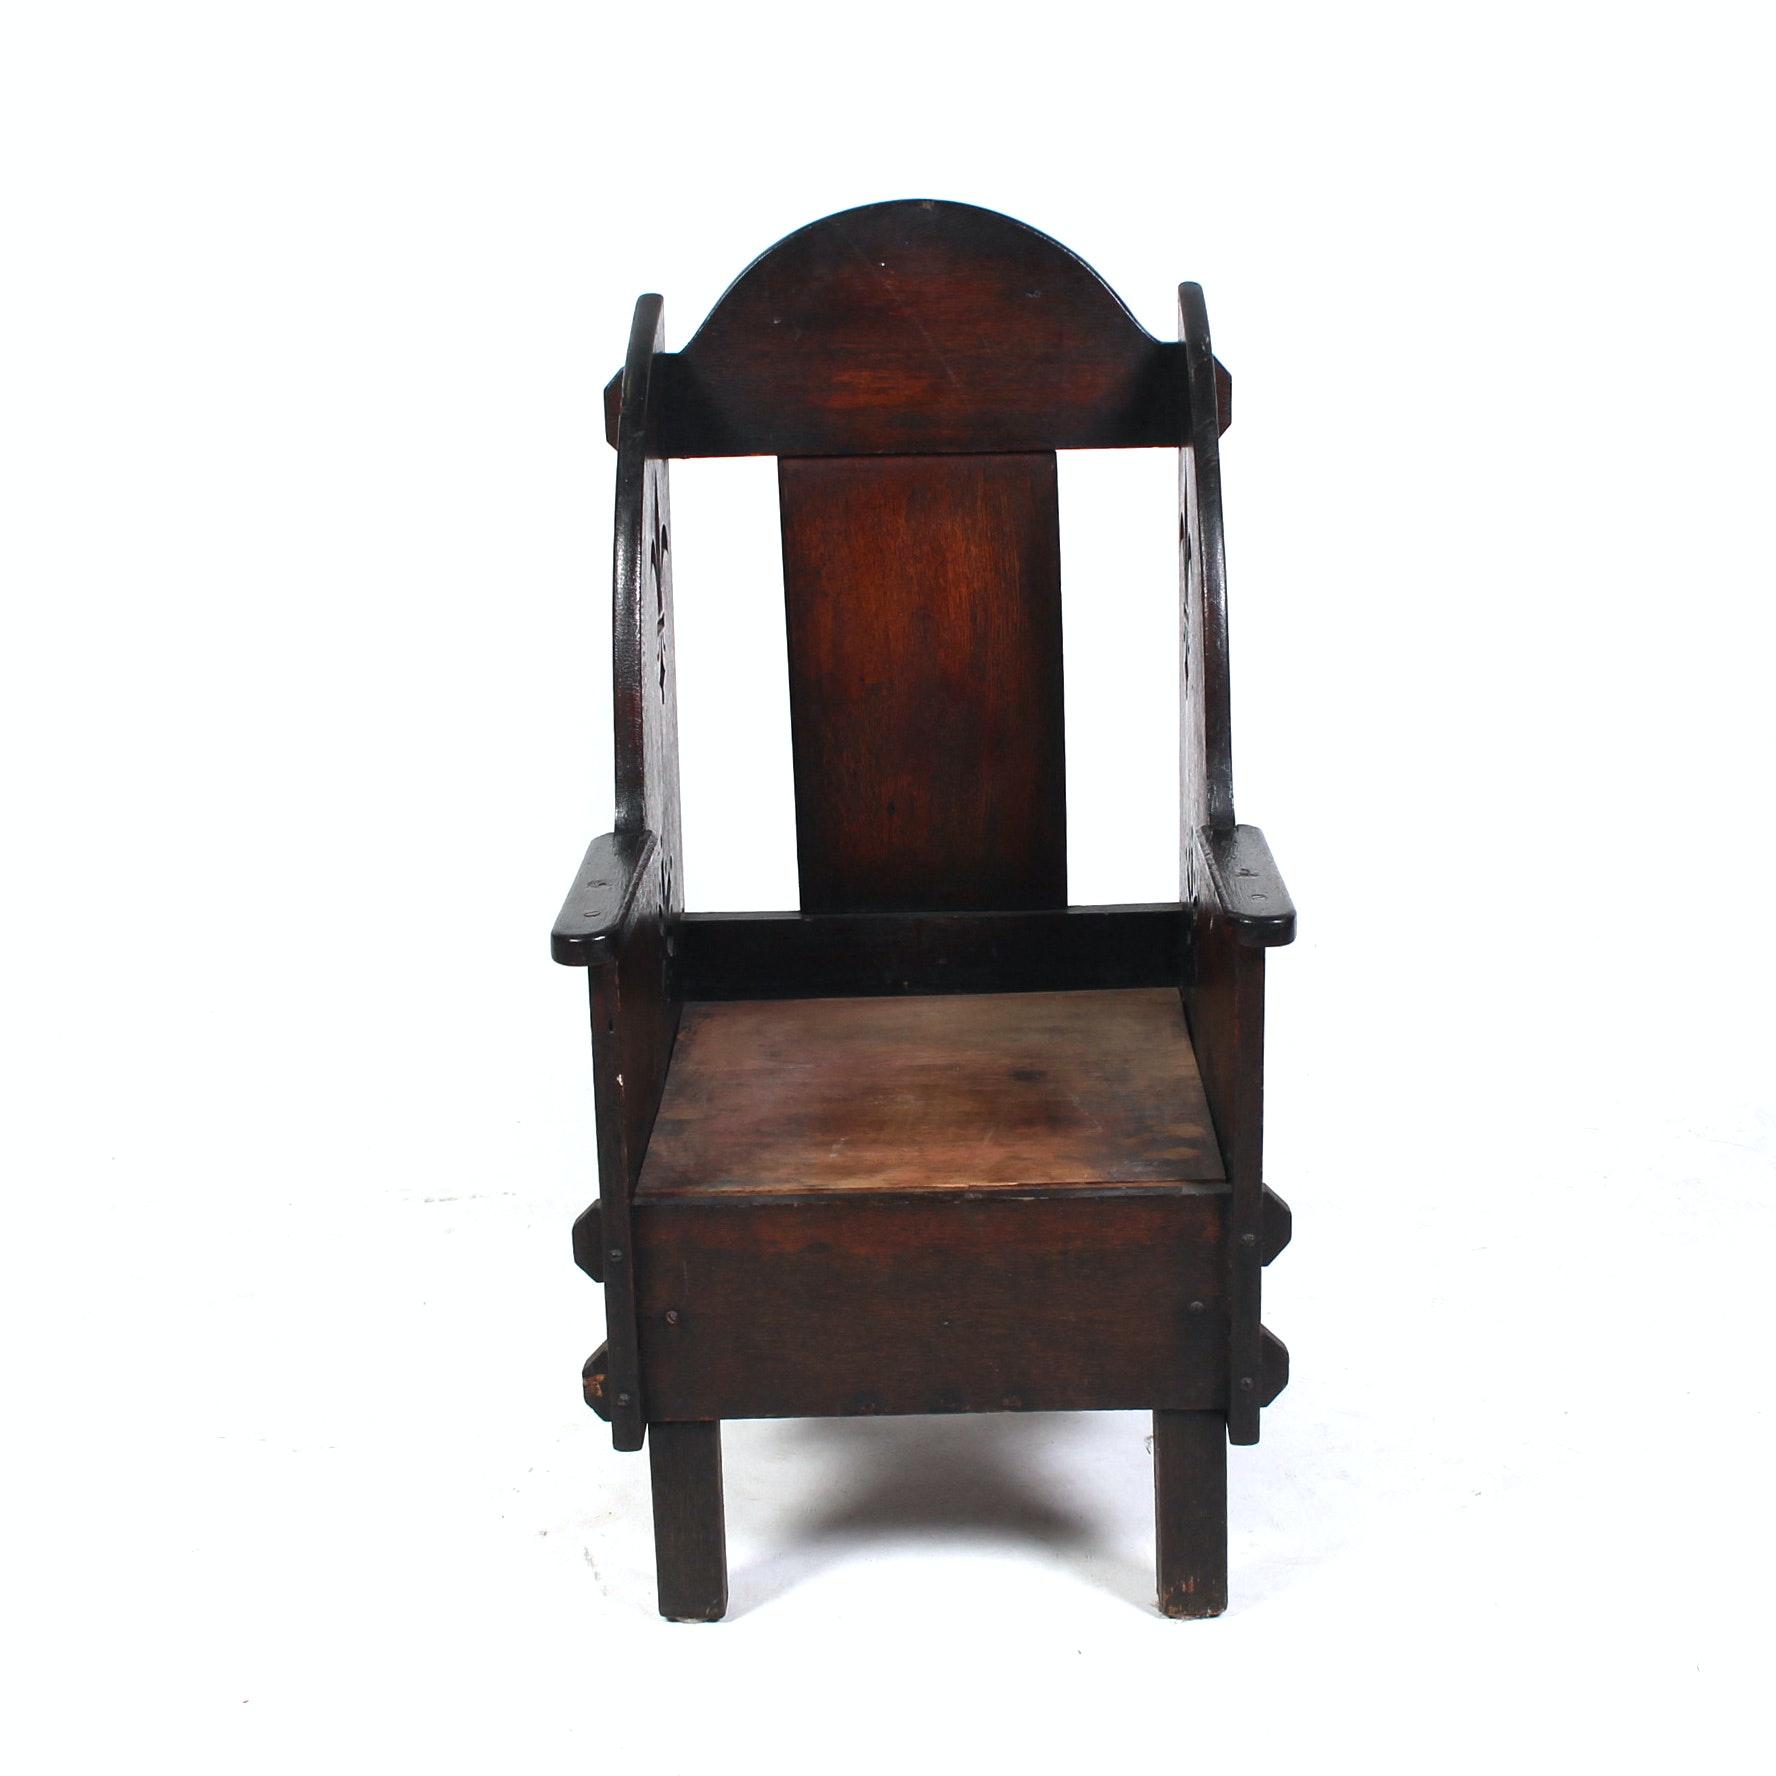 Antique Netherlandic Chair